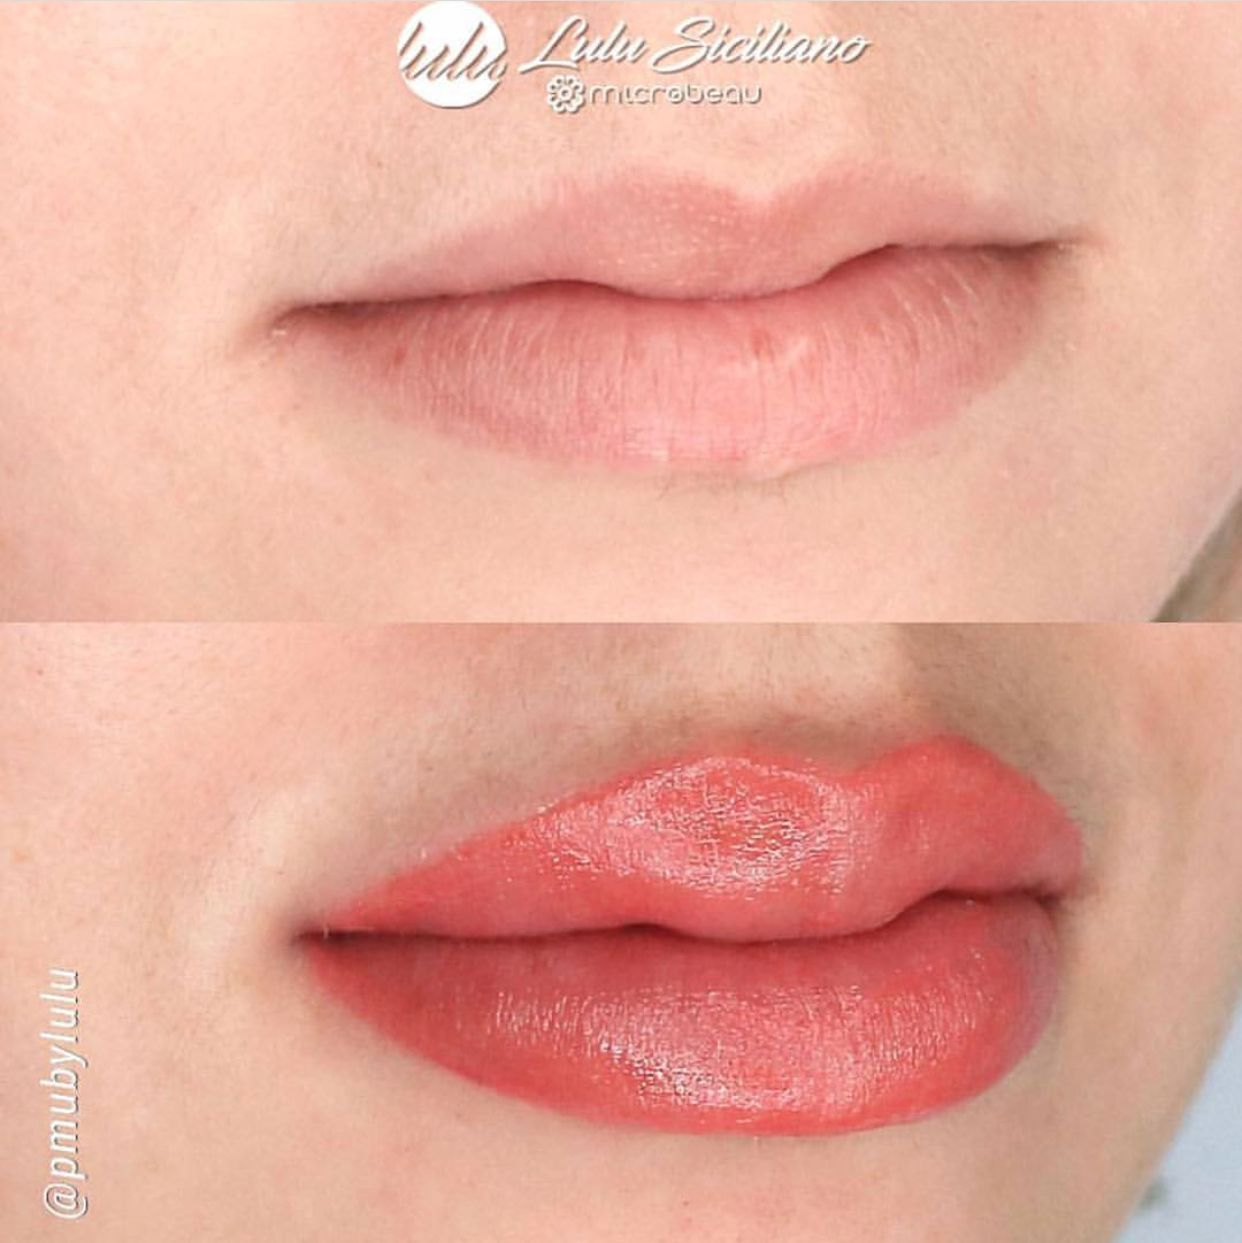 Acuarela lips done by microbeauelite artist pmubylulu